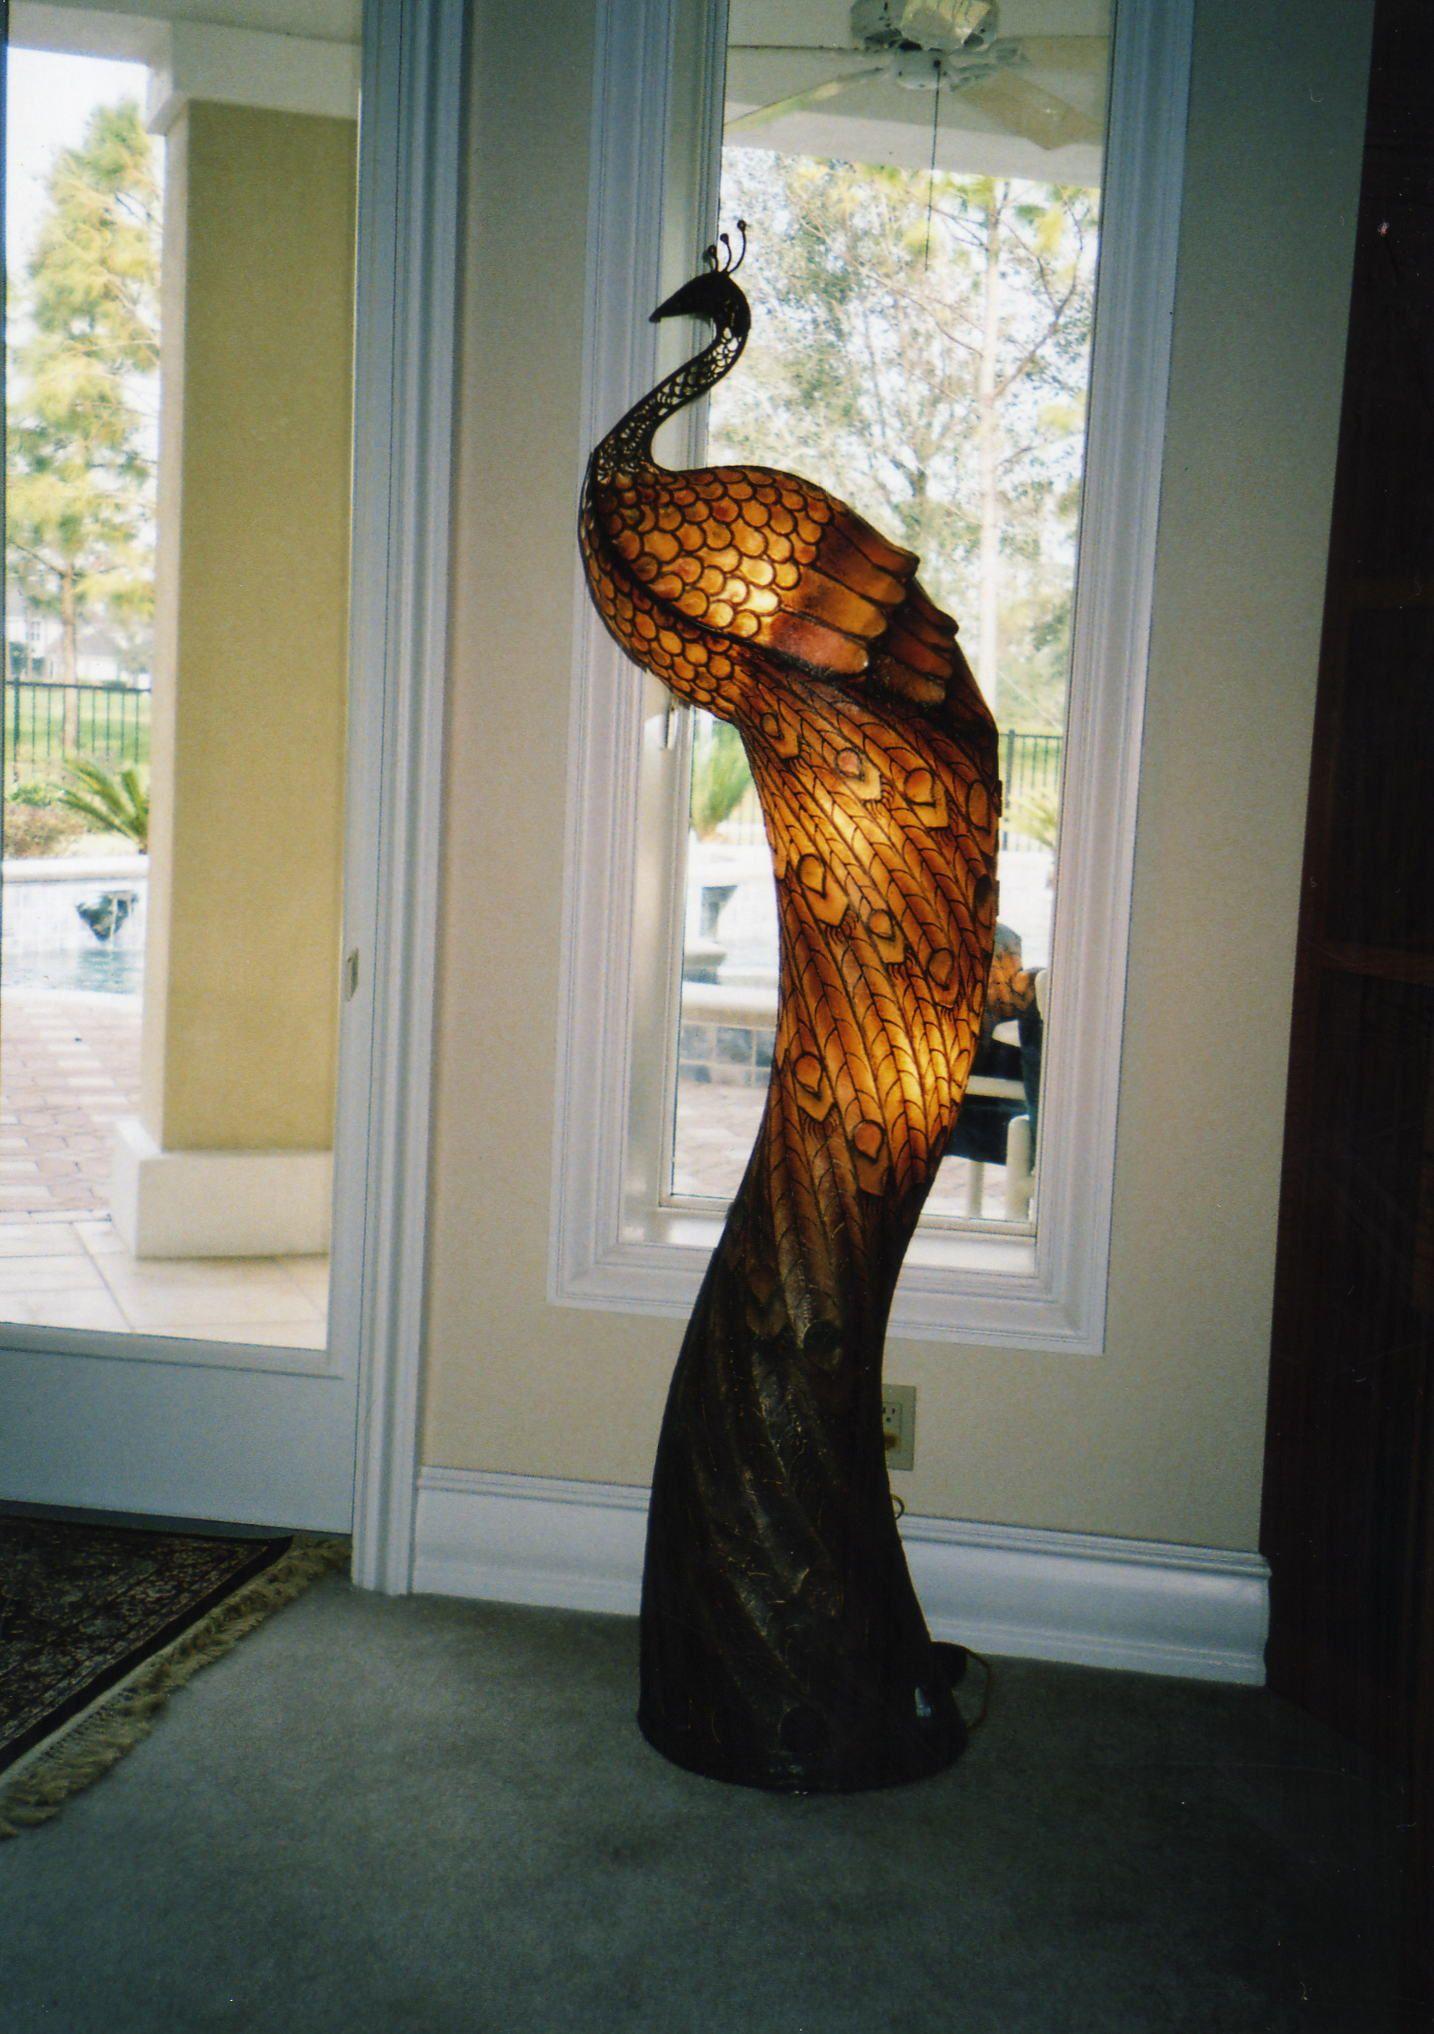 Elegant FOR SALE: Peacock Shaped Floor Standing Lamp